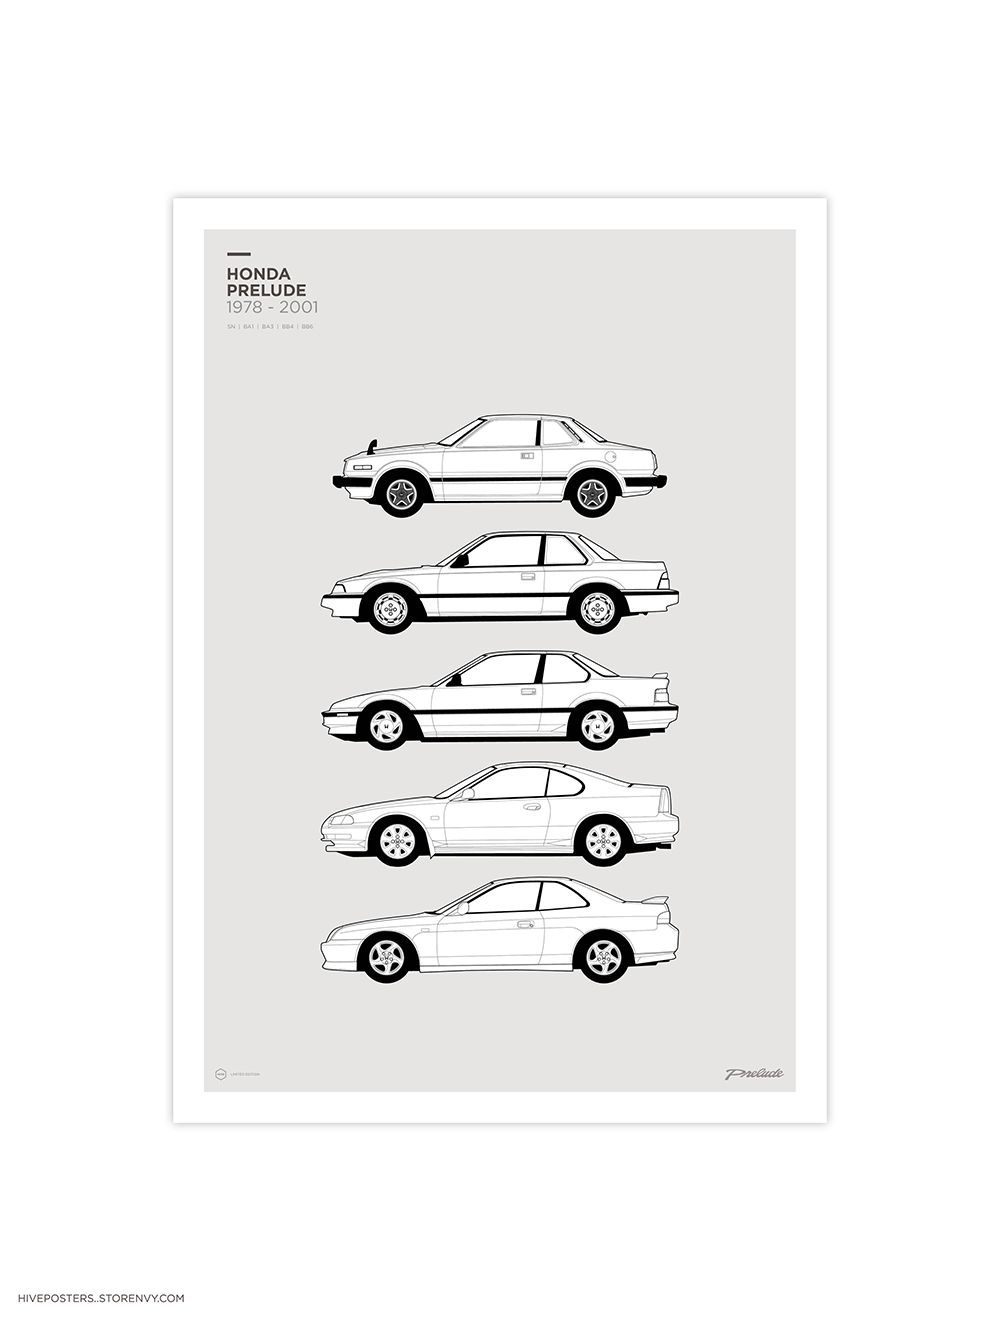 Honda Prelude Generations Poster - Thumbnail 1